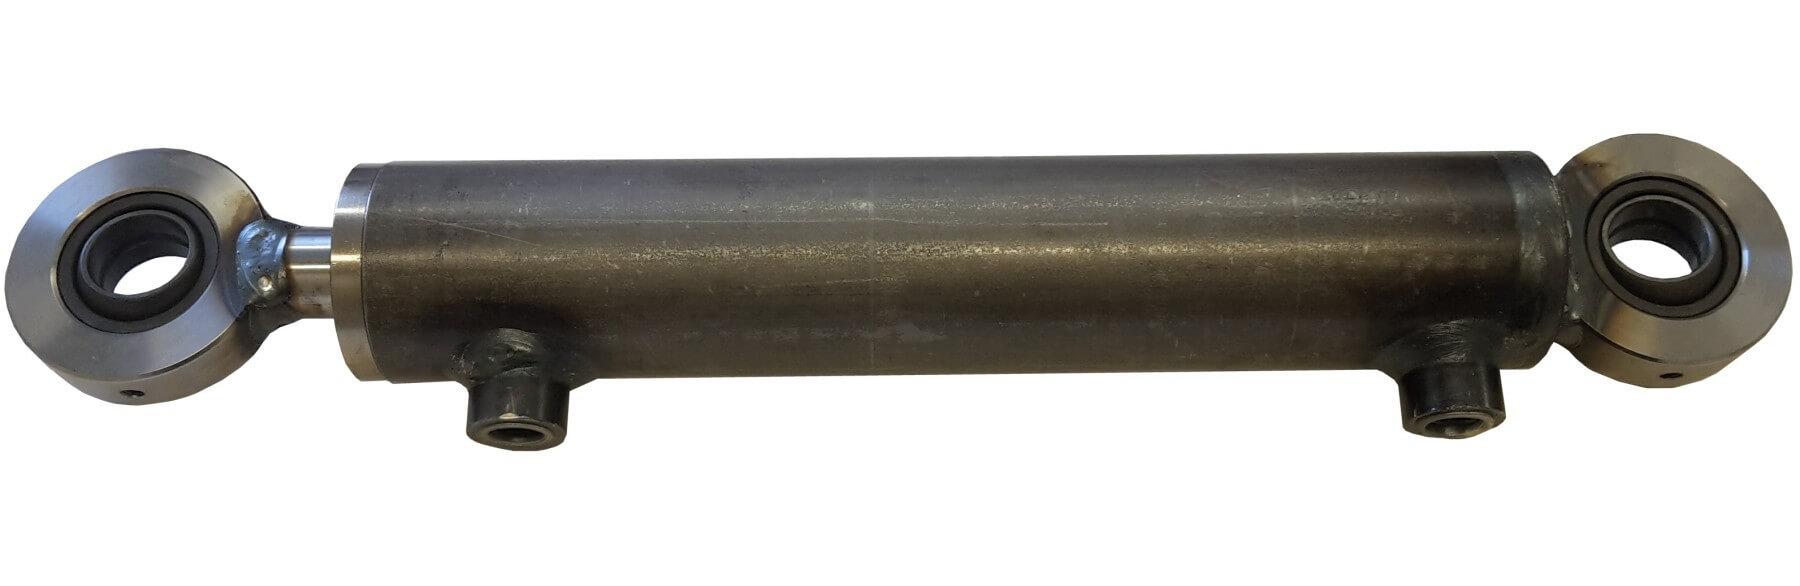 Hydraulisylinteri CL 100. 60. 500 GE